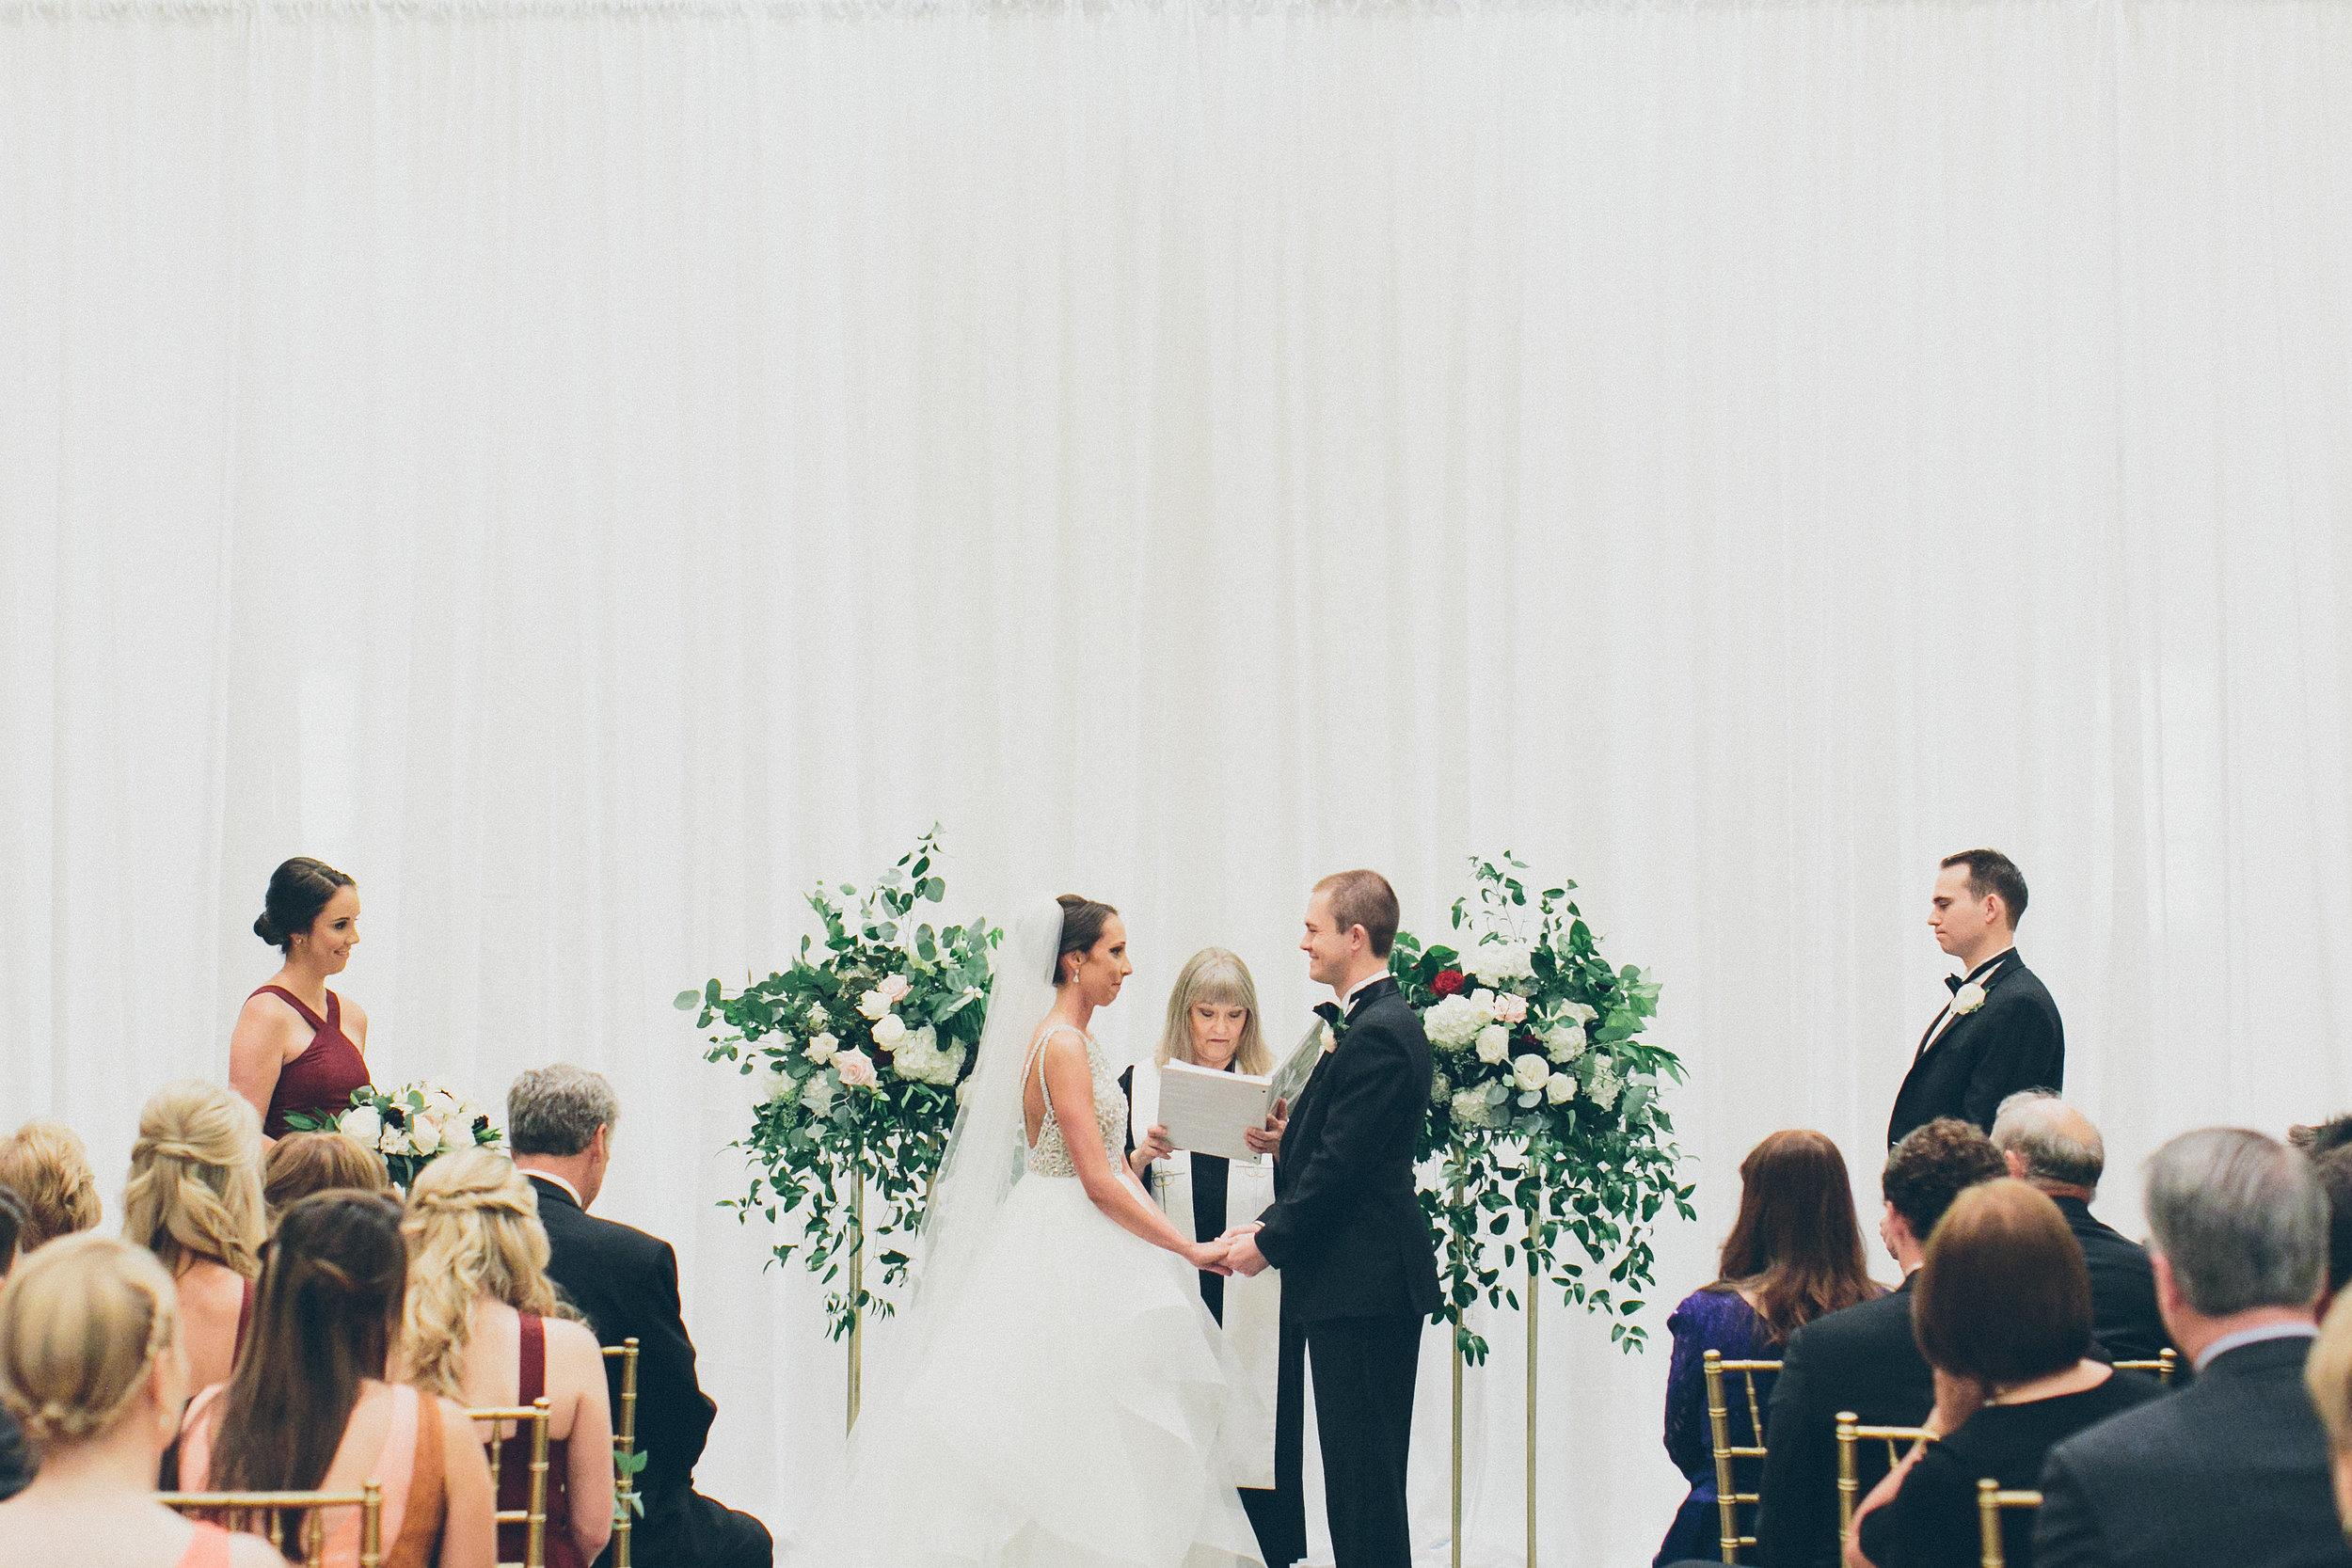 02_Ceremony_0264.jpg